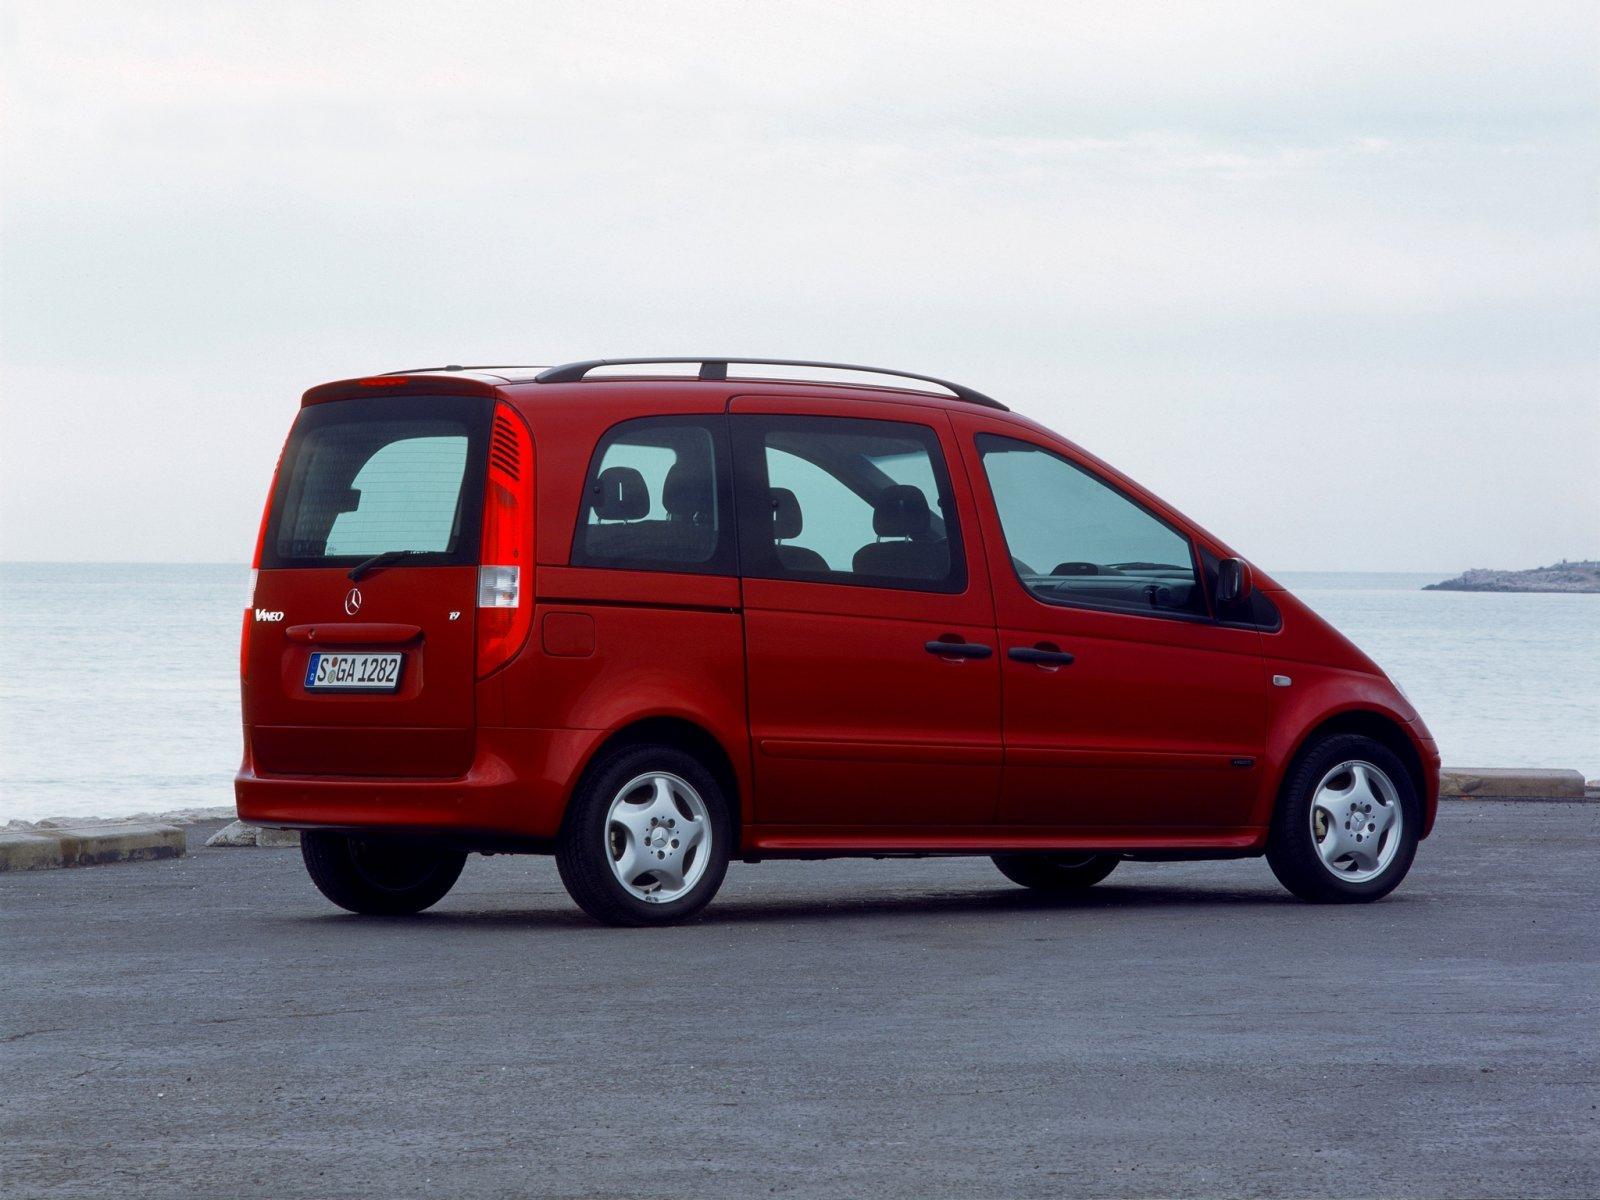 Mercedes-Benz (Мерседес-Бенц) Vaneo 2002-2006 г.